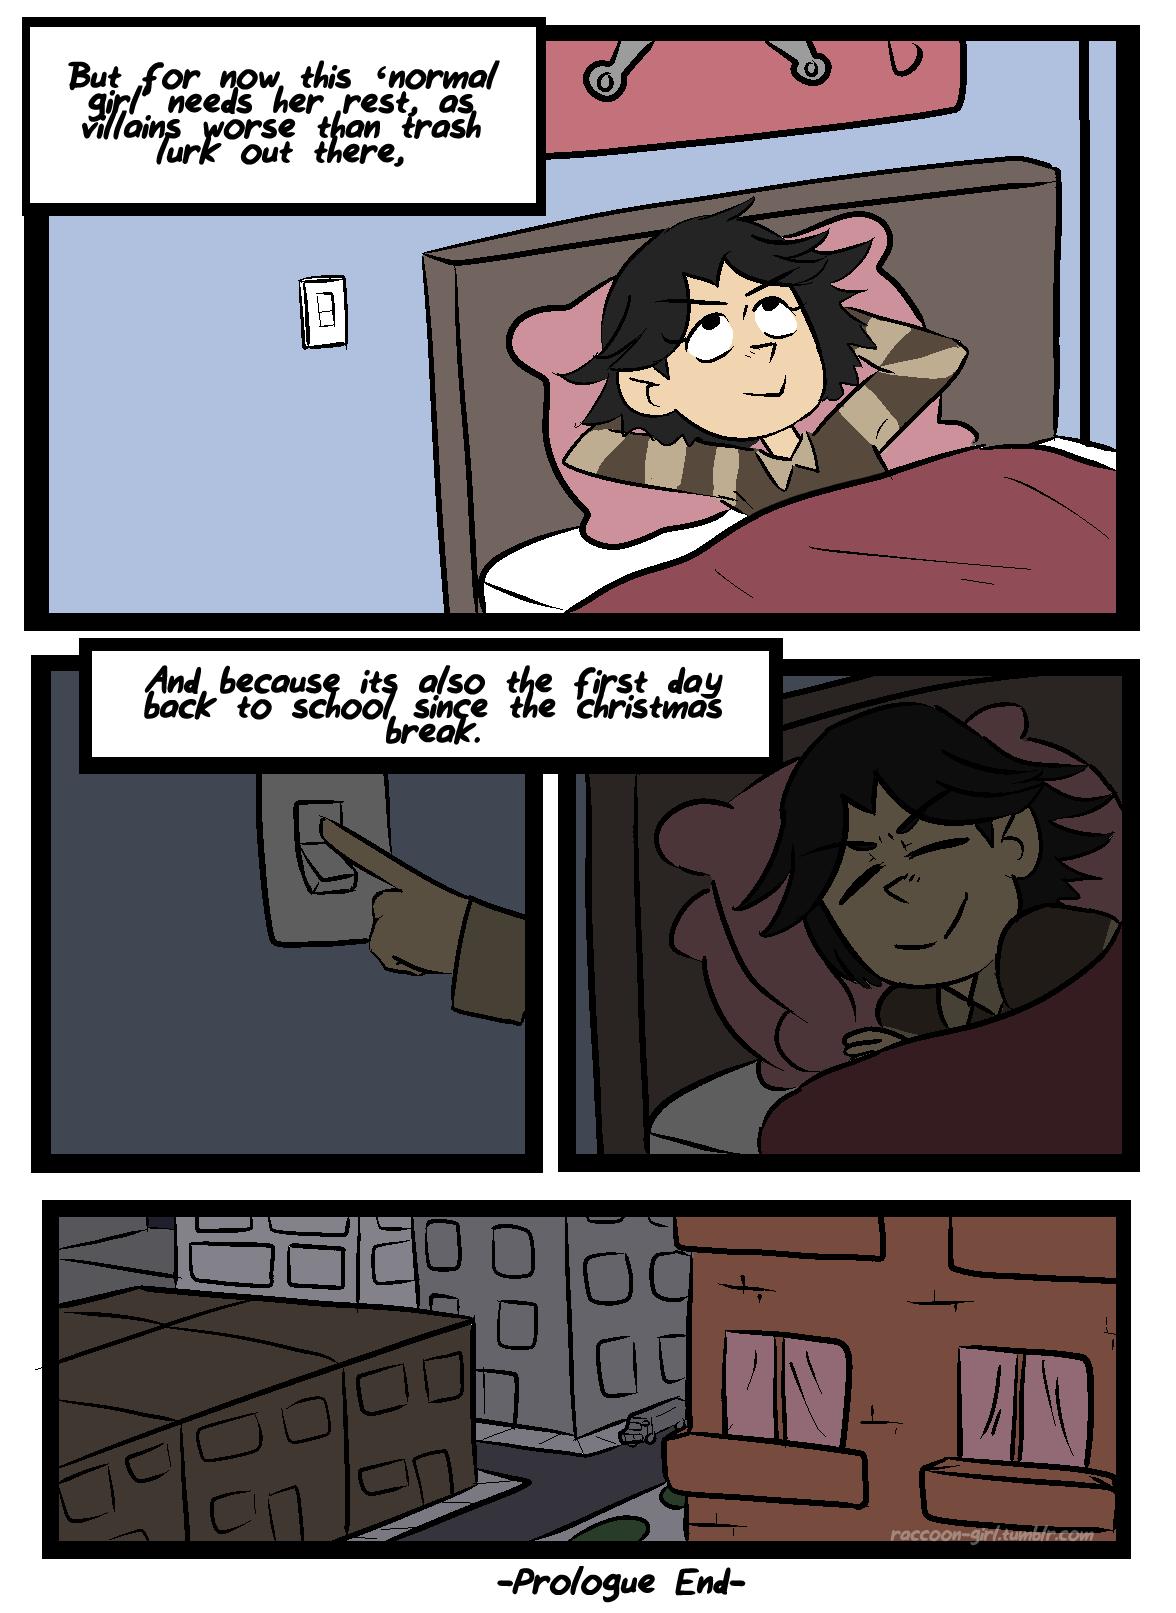 raccoongirl-page10